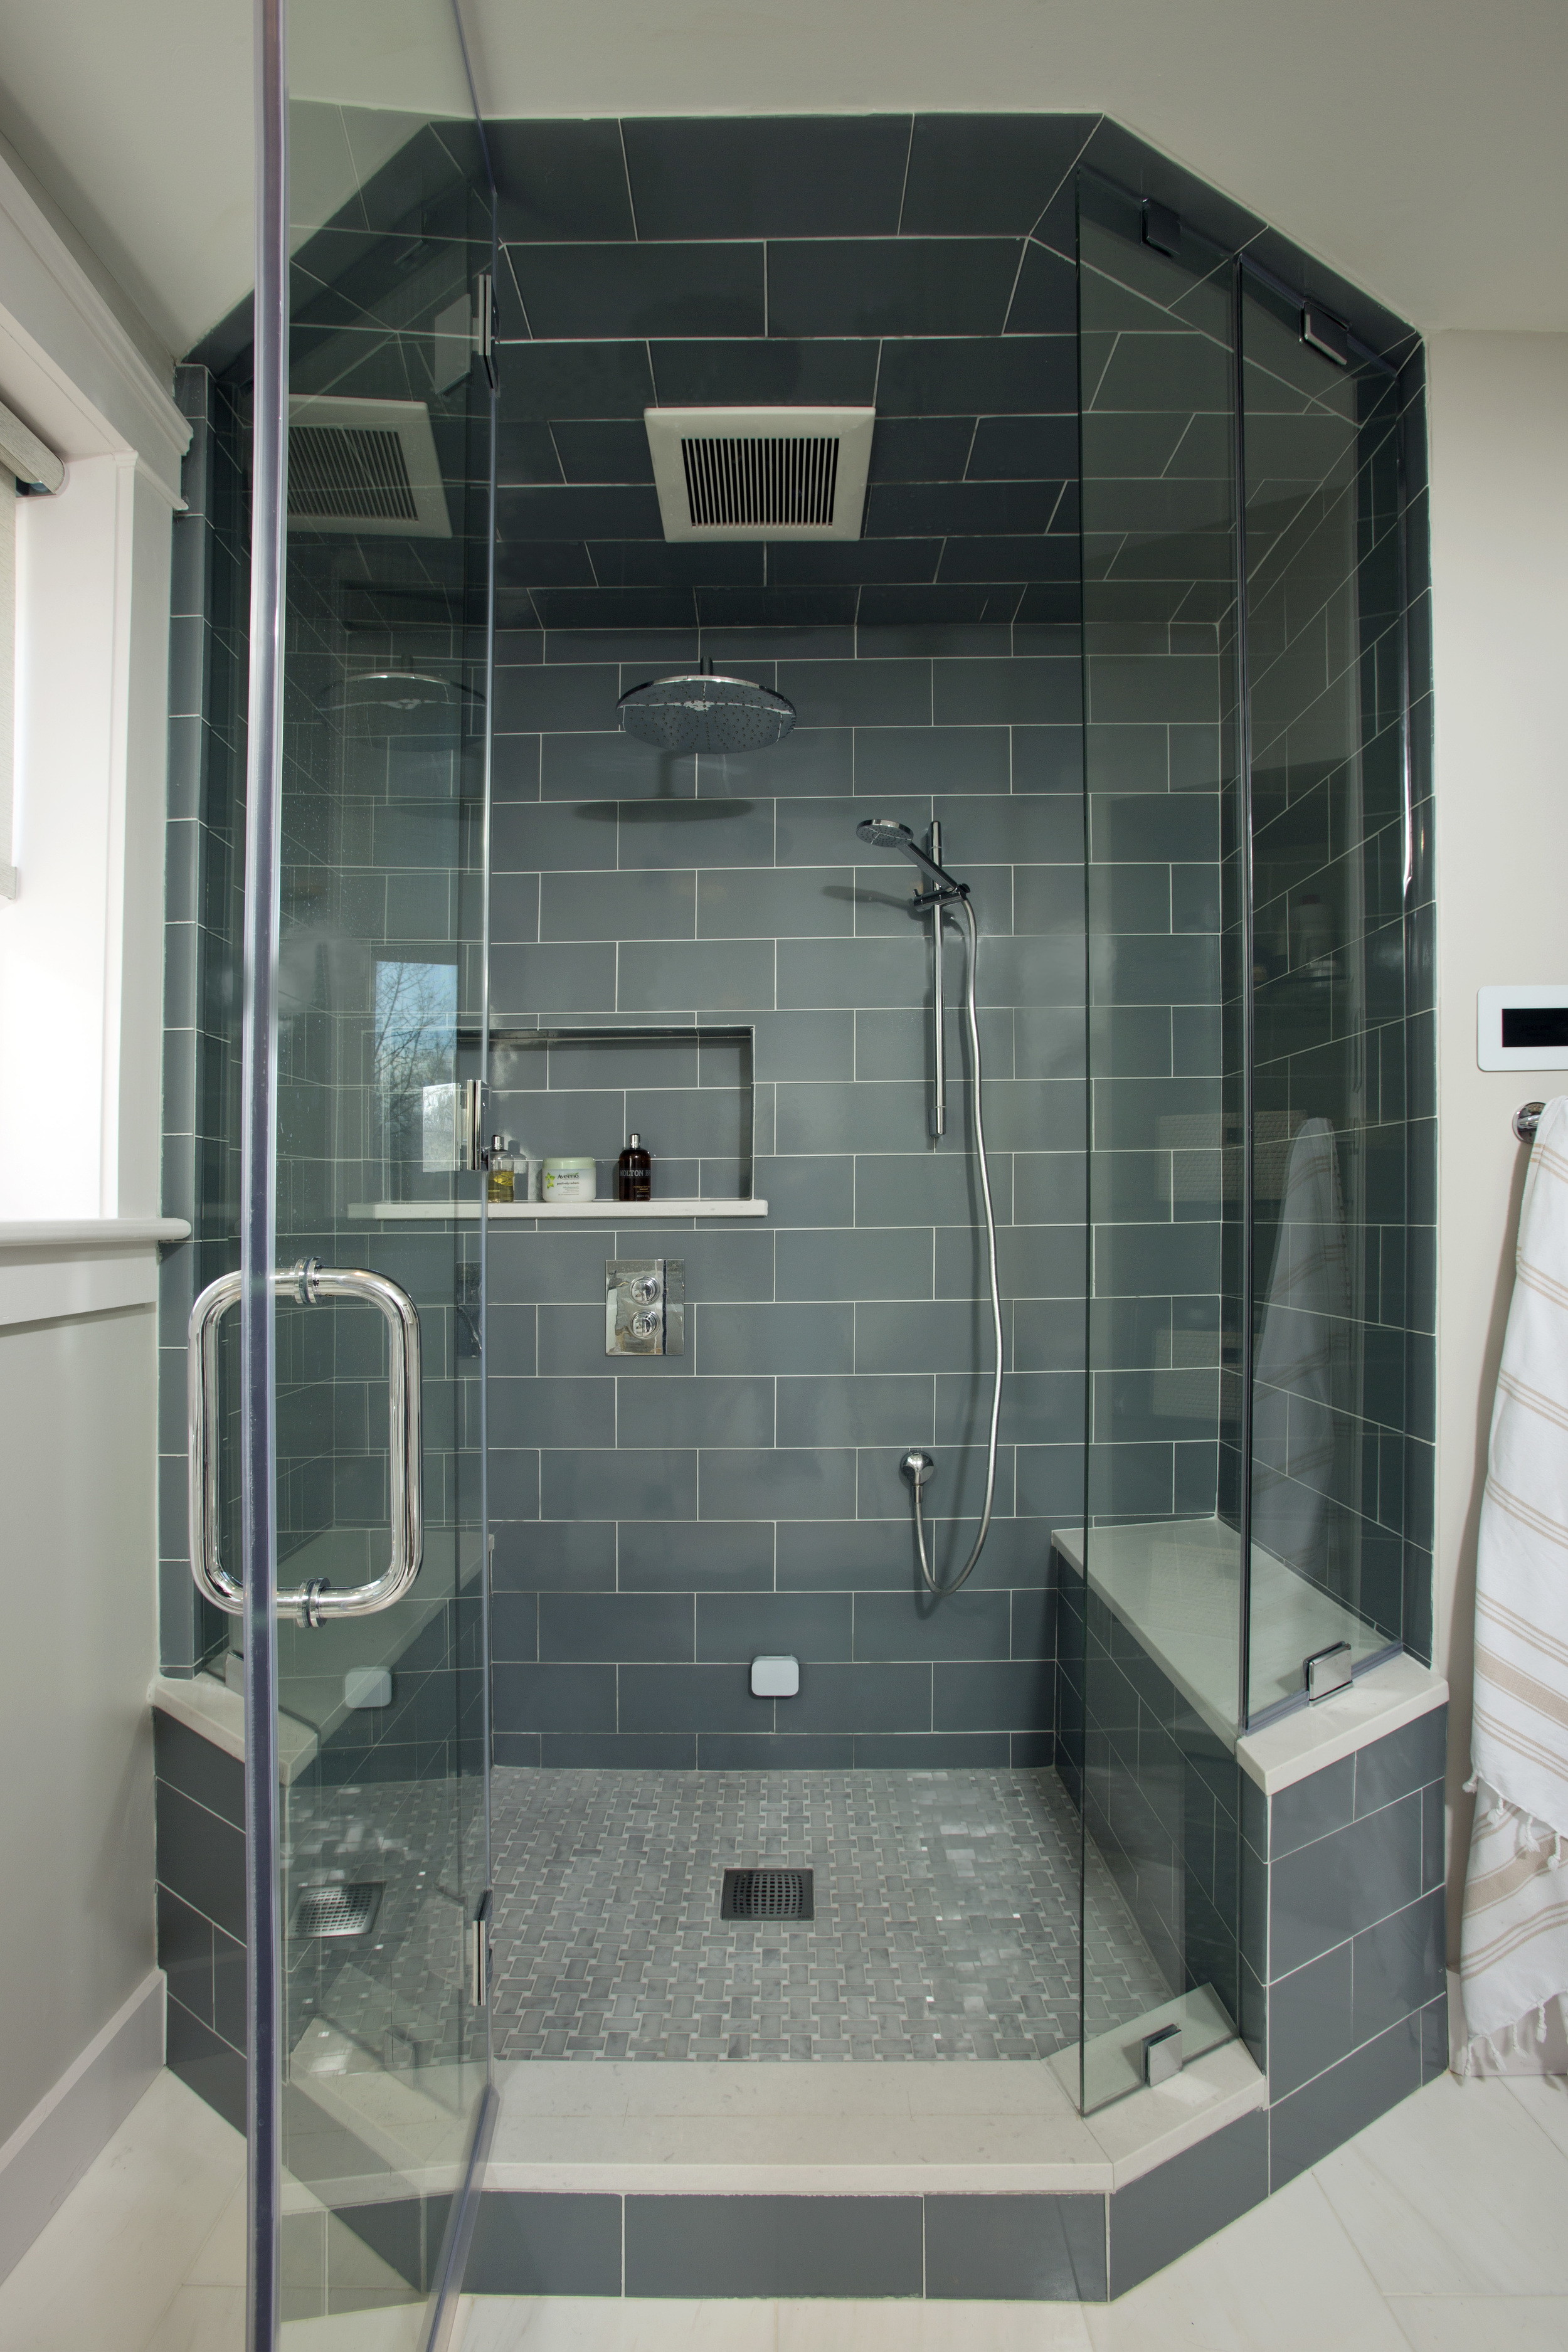 Lowans_shower_85.jpg